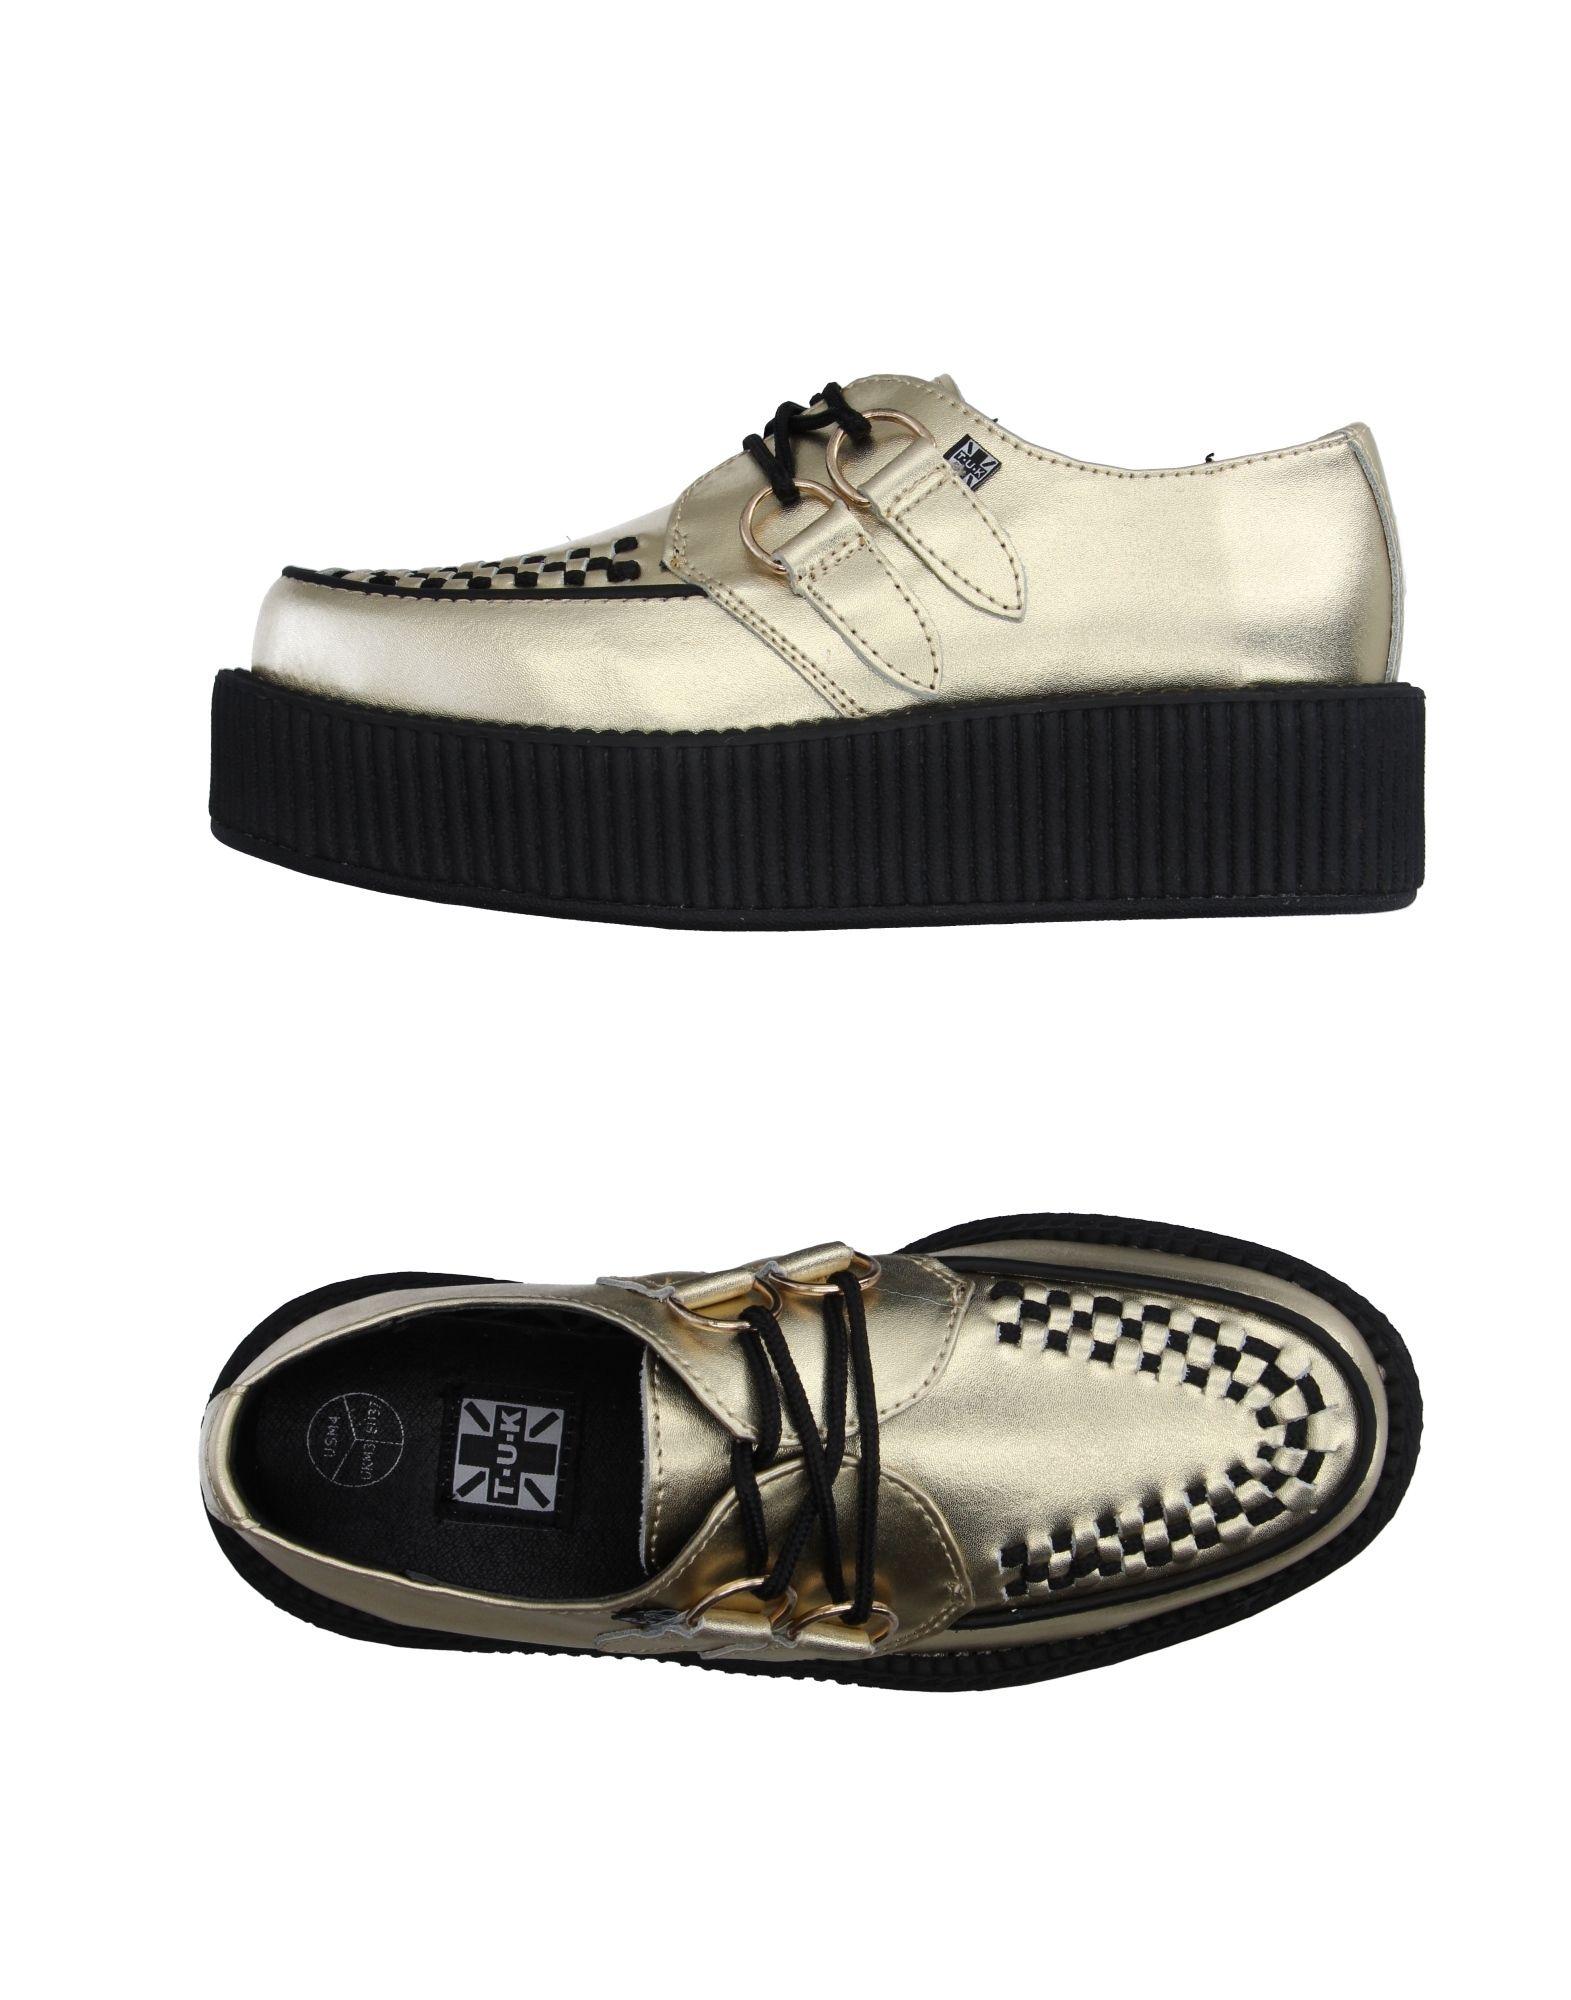 T.U.K Schnürschuhe Damen  Heiße 11156591TB Heiße  Schuhe 08c202